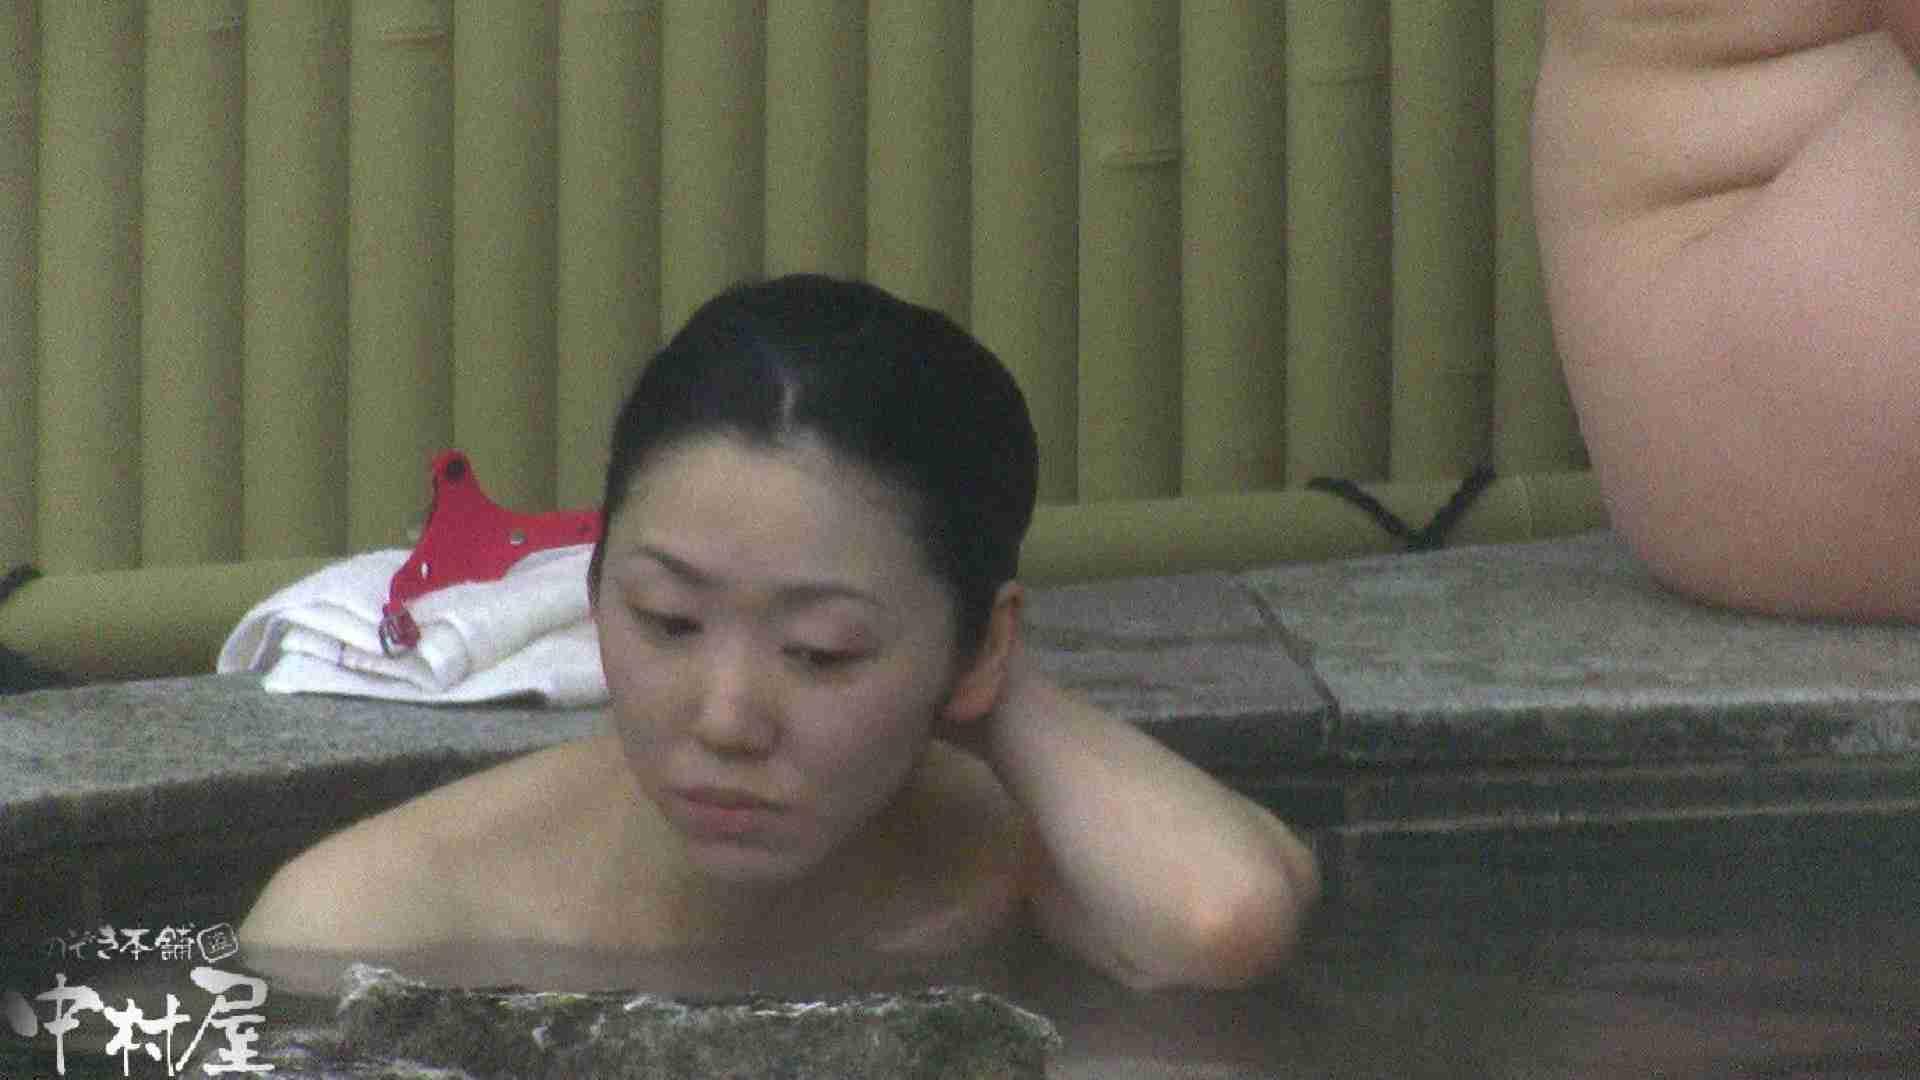 Aquaな露天風呂Vol.917 OLセックス  102画像 42